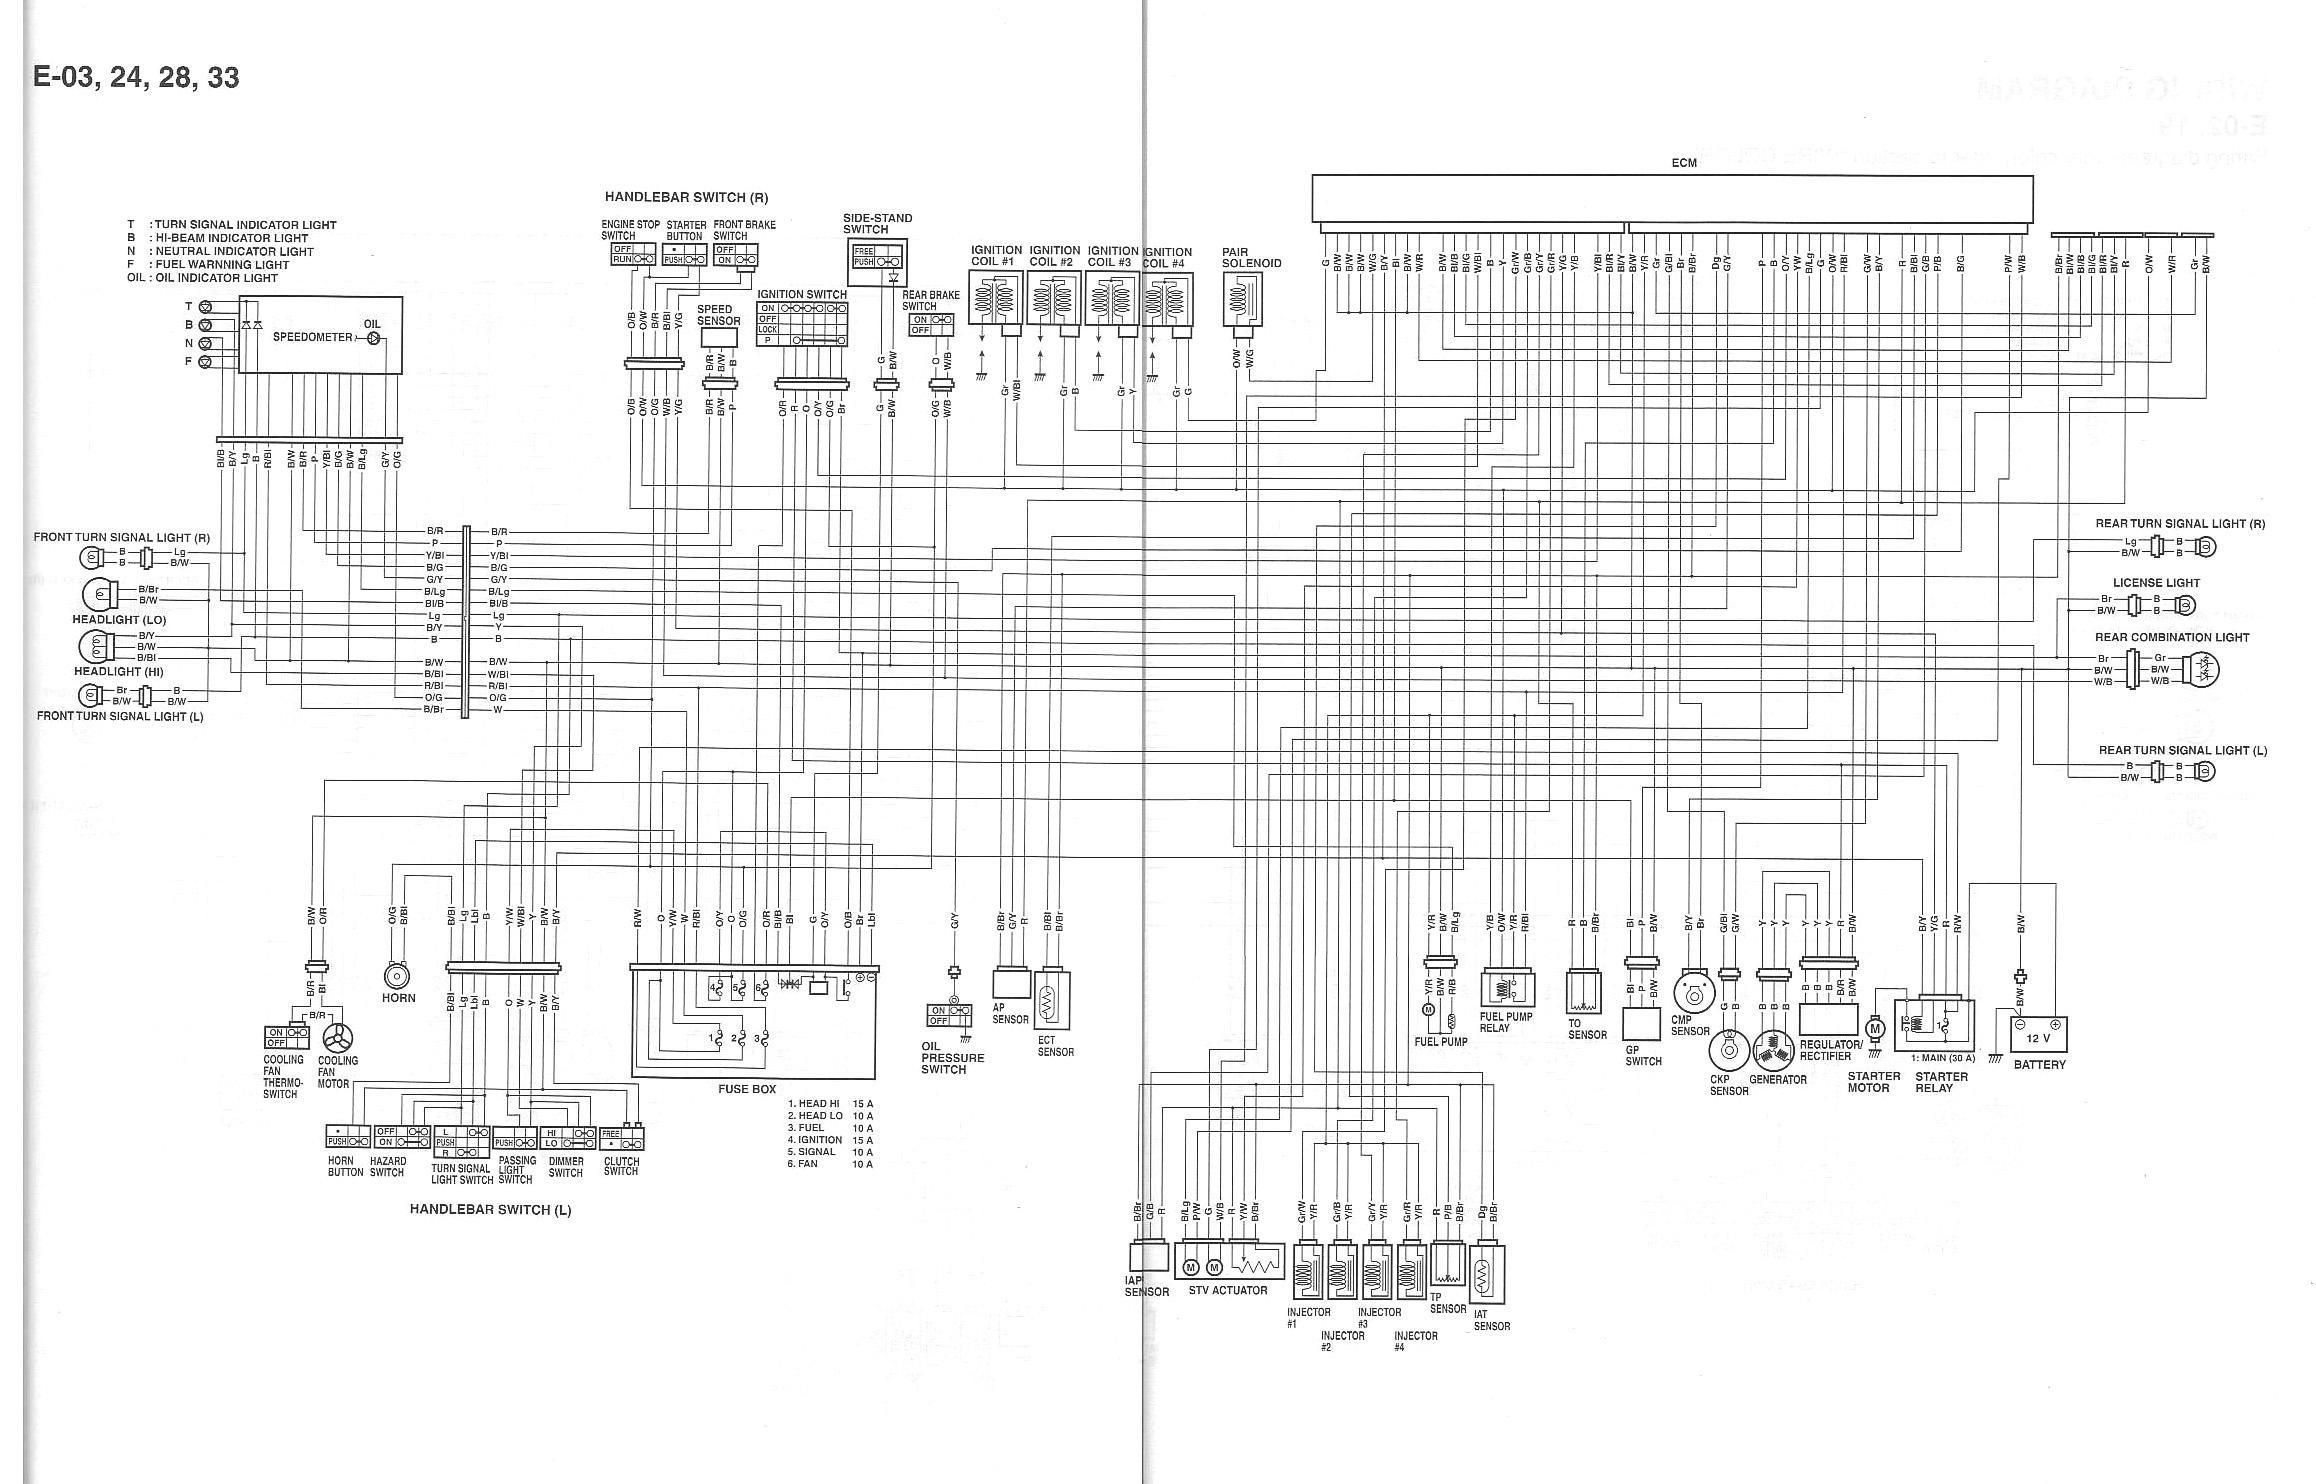 wiring diagram | suzuki gsx-r motorcycle forums gixxer.com  gixxer.com